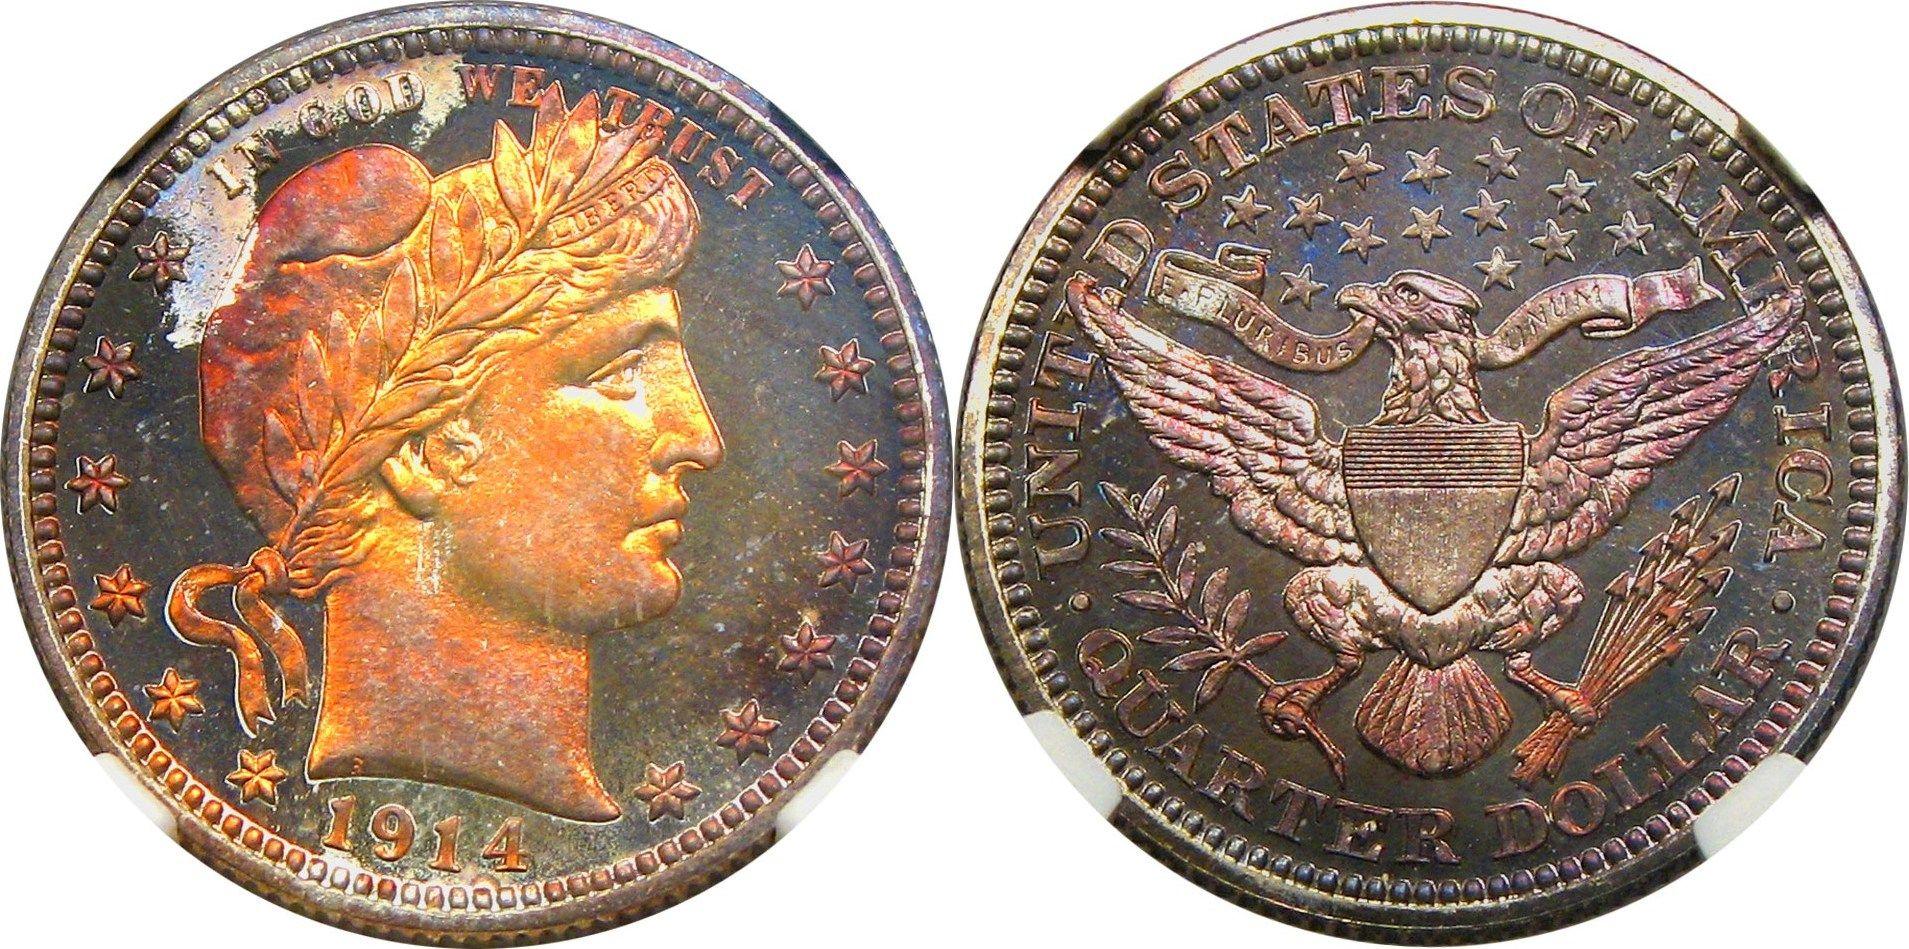 1914 coins worth